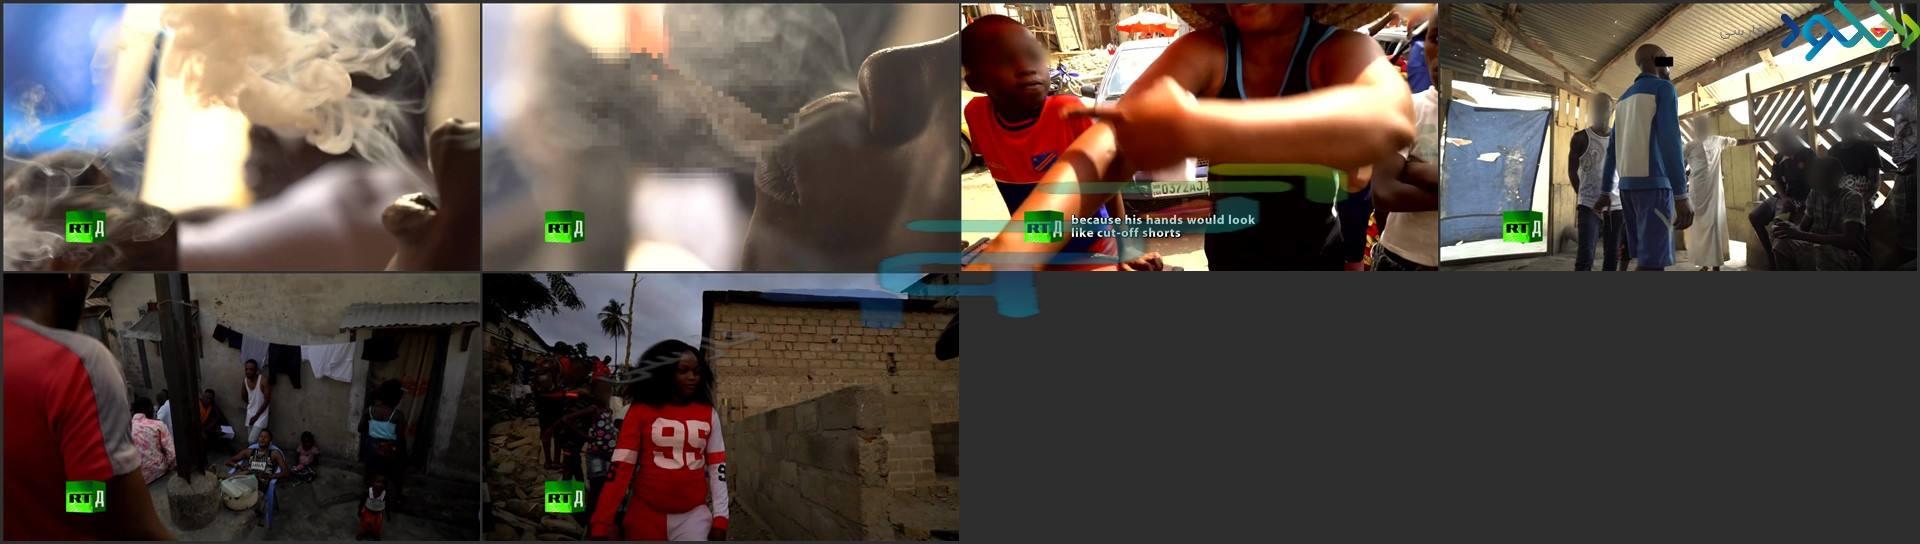 www.download.ir.Machete.boys.of.Congo.mp4